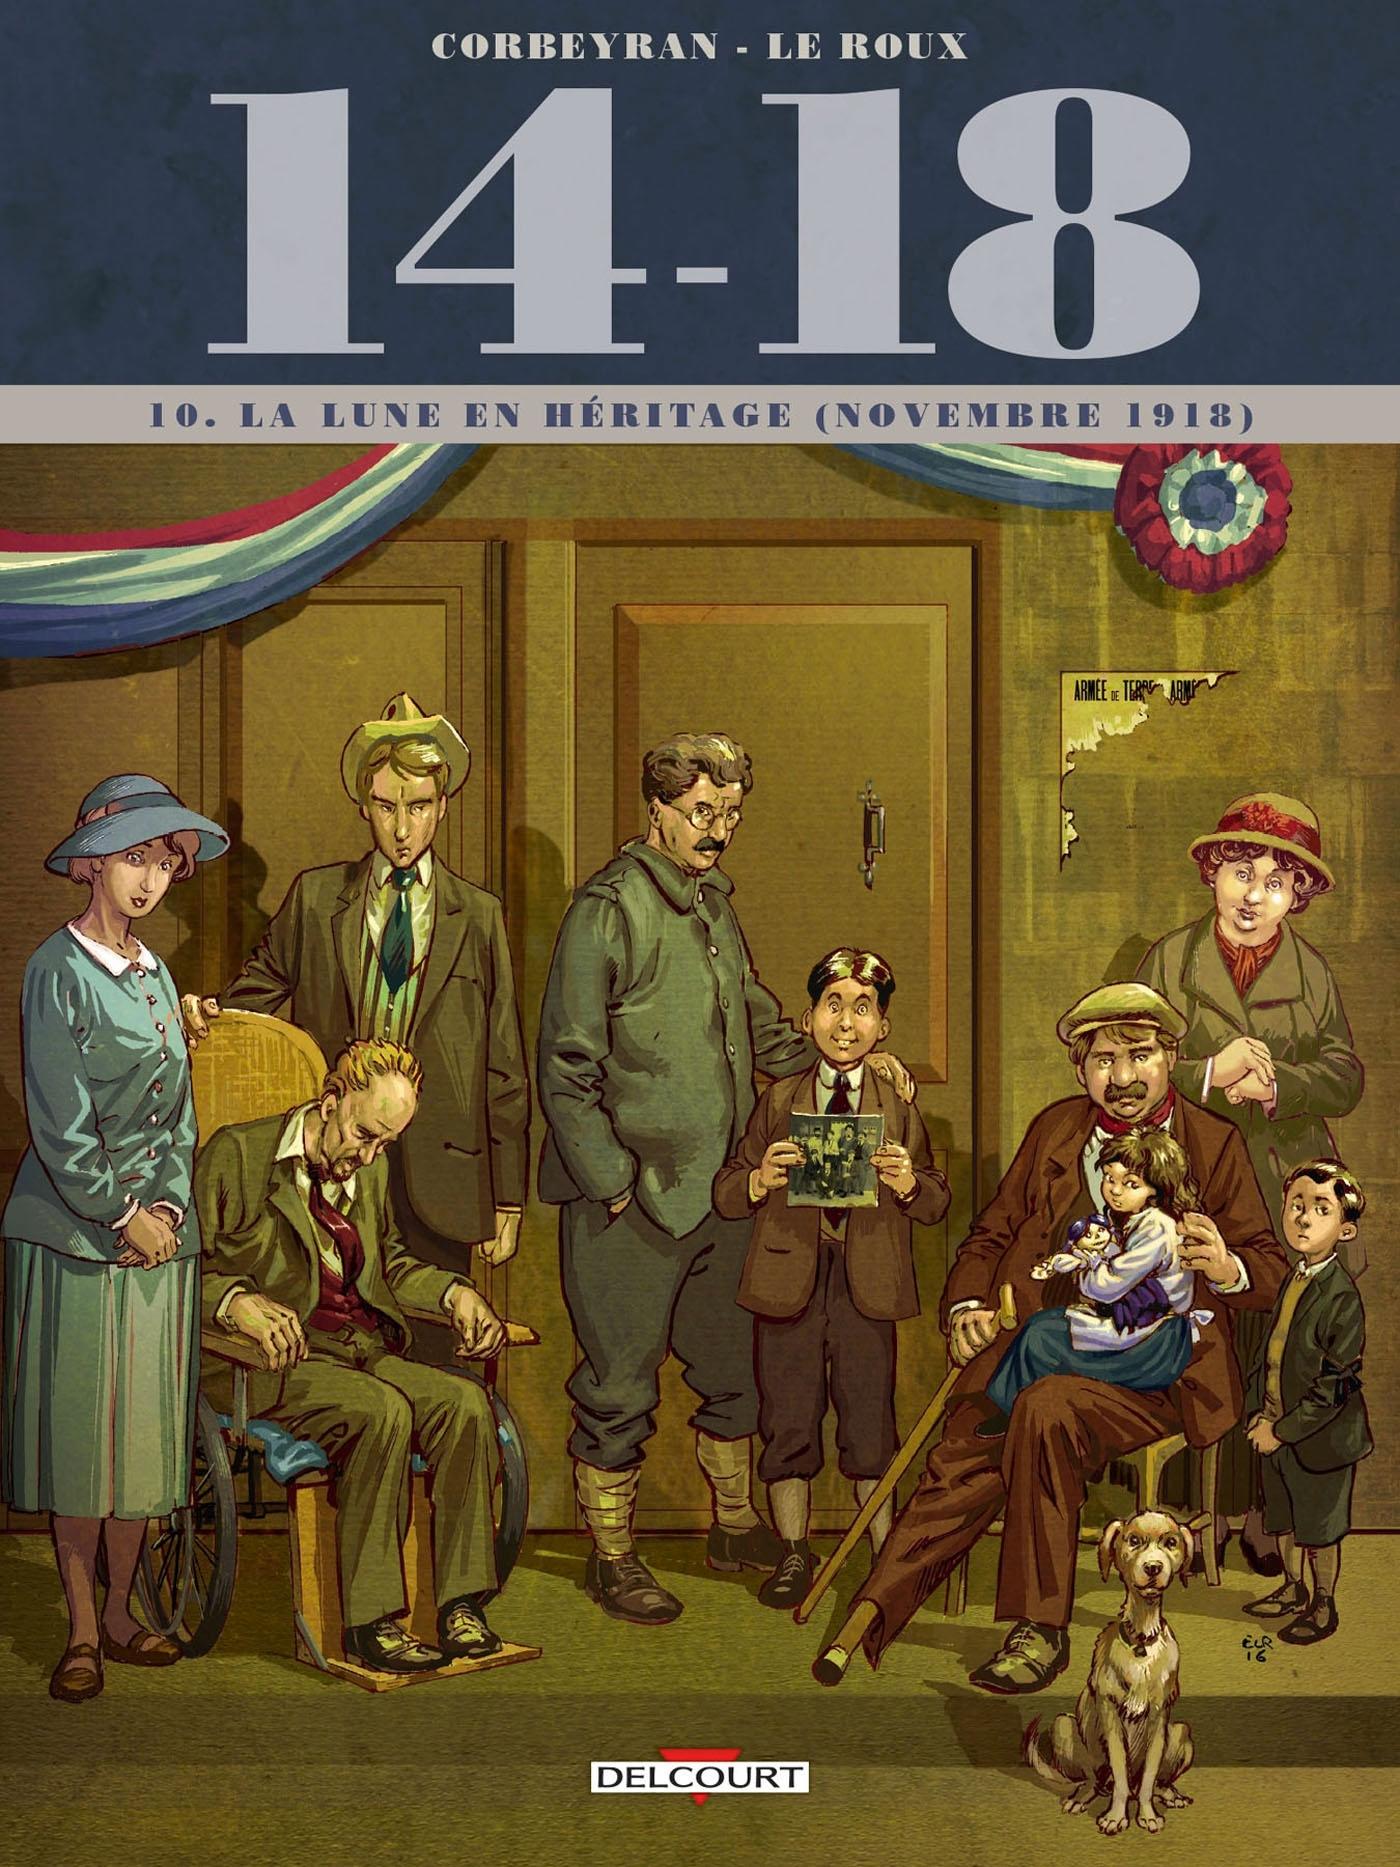 14-18 T10. LA LUNE EN HERITAGE (NOVEMBRE 1918)